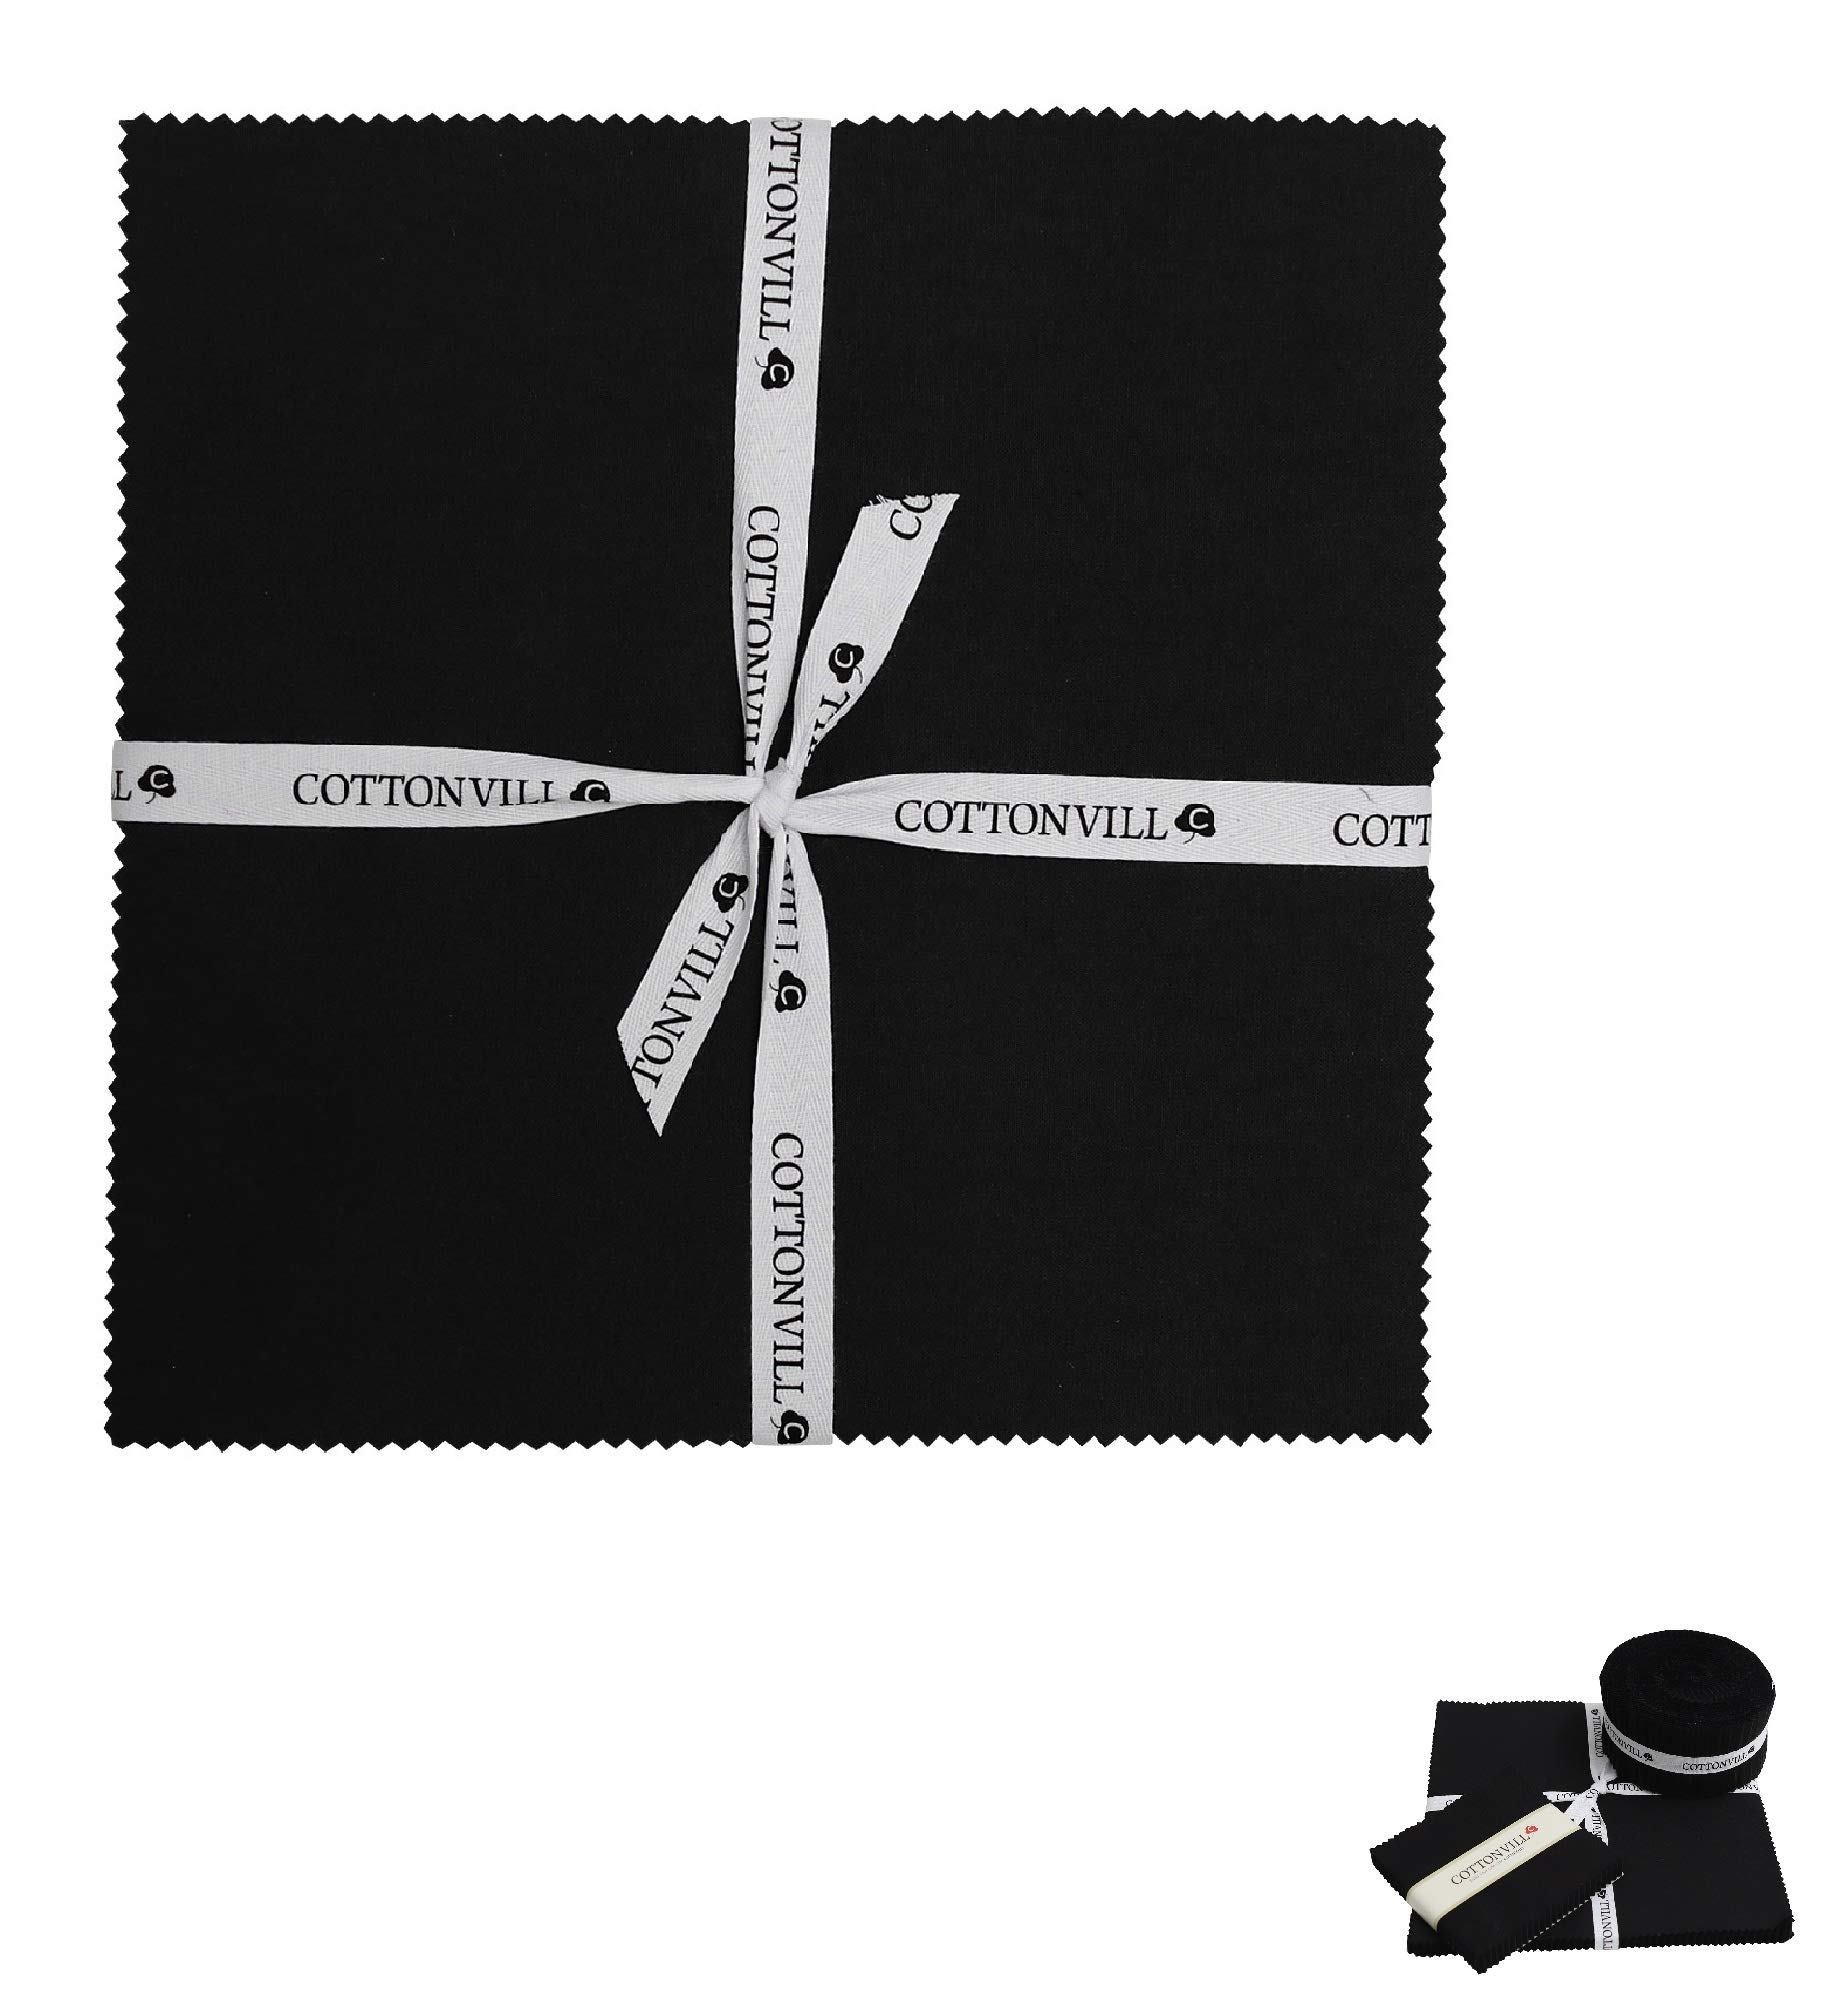 COTTONVILL Cotton Solid Precut Quilting Fabric Bundle 42 pcs, Black (10'' Squares) by COTTONVILL